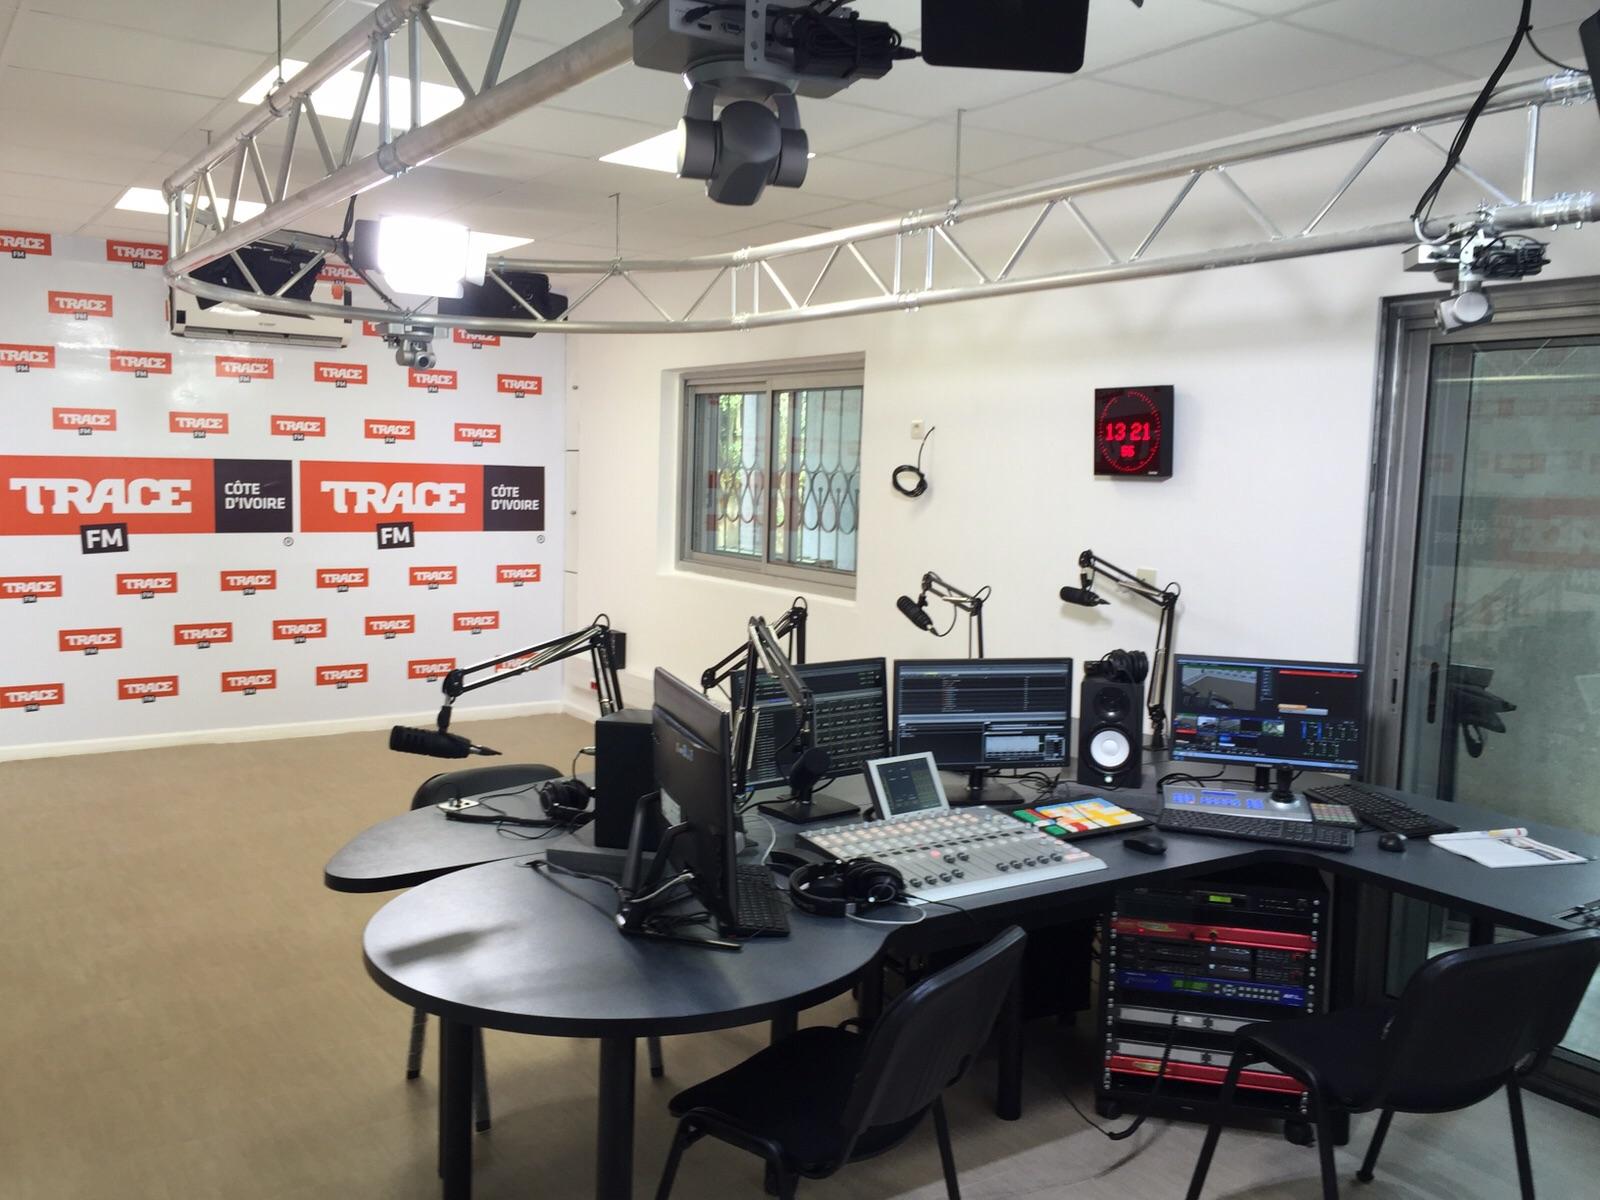 Trace lance sa première radio africaine : Trace FM